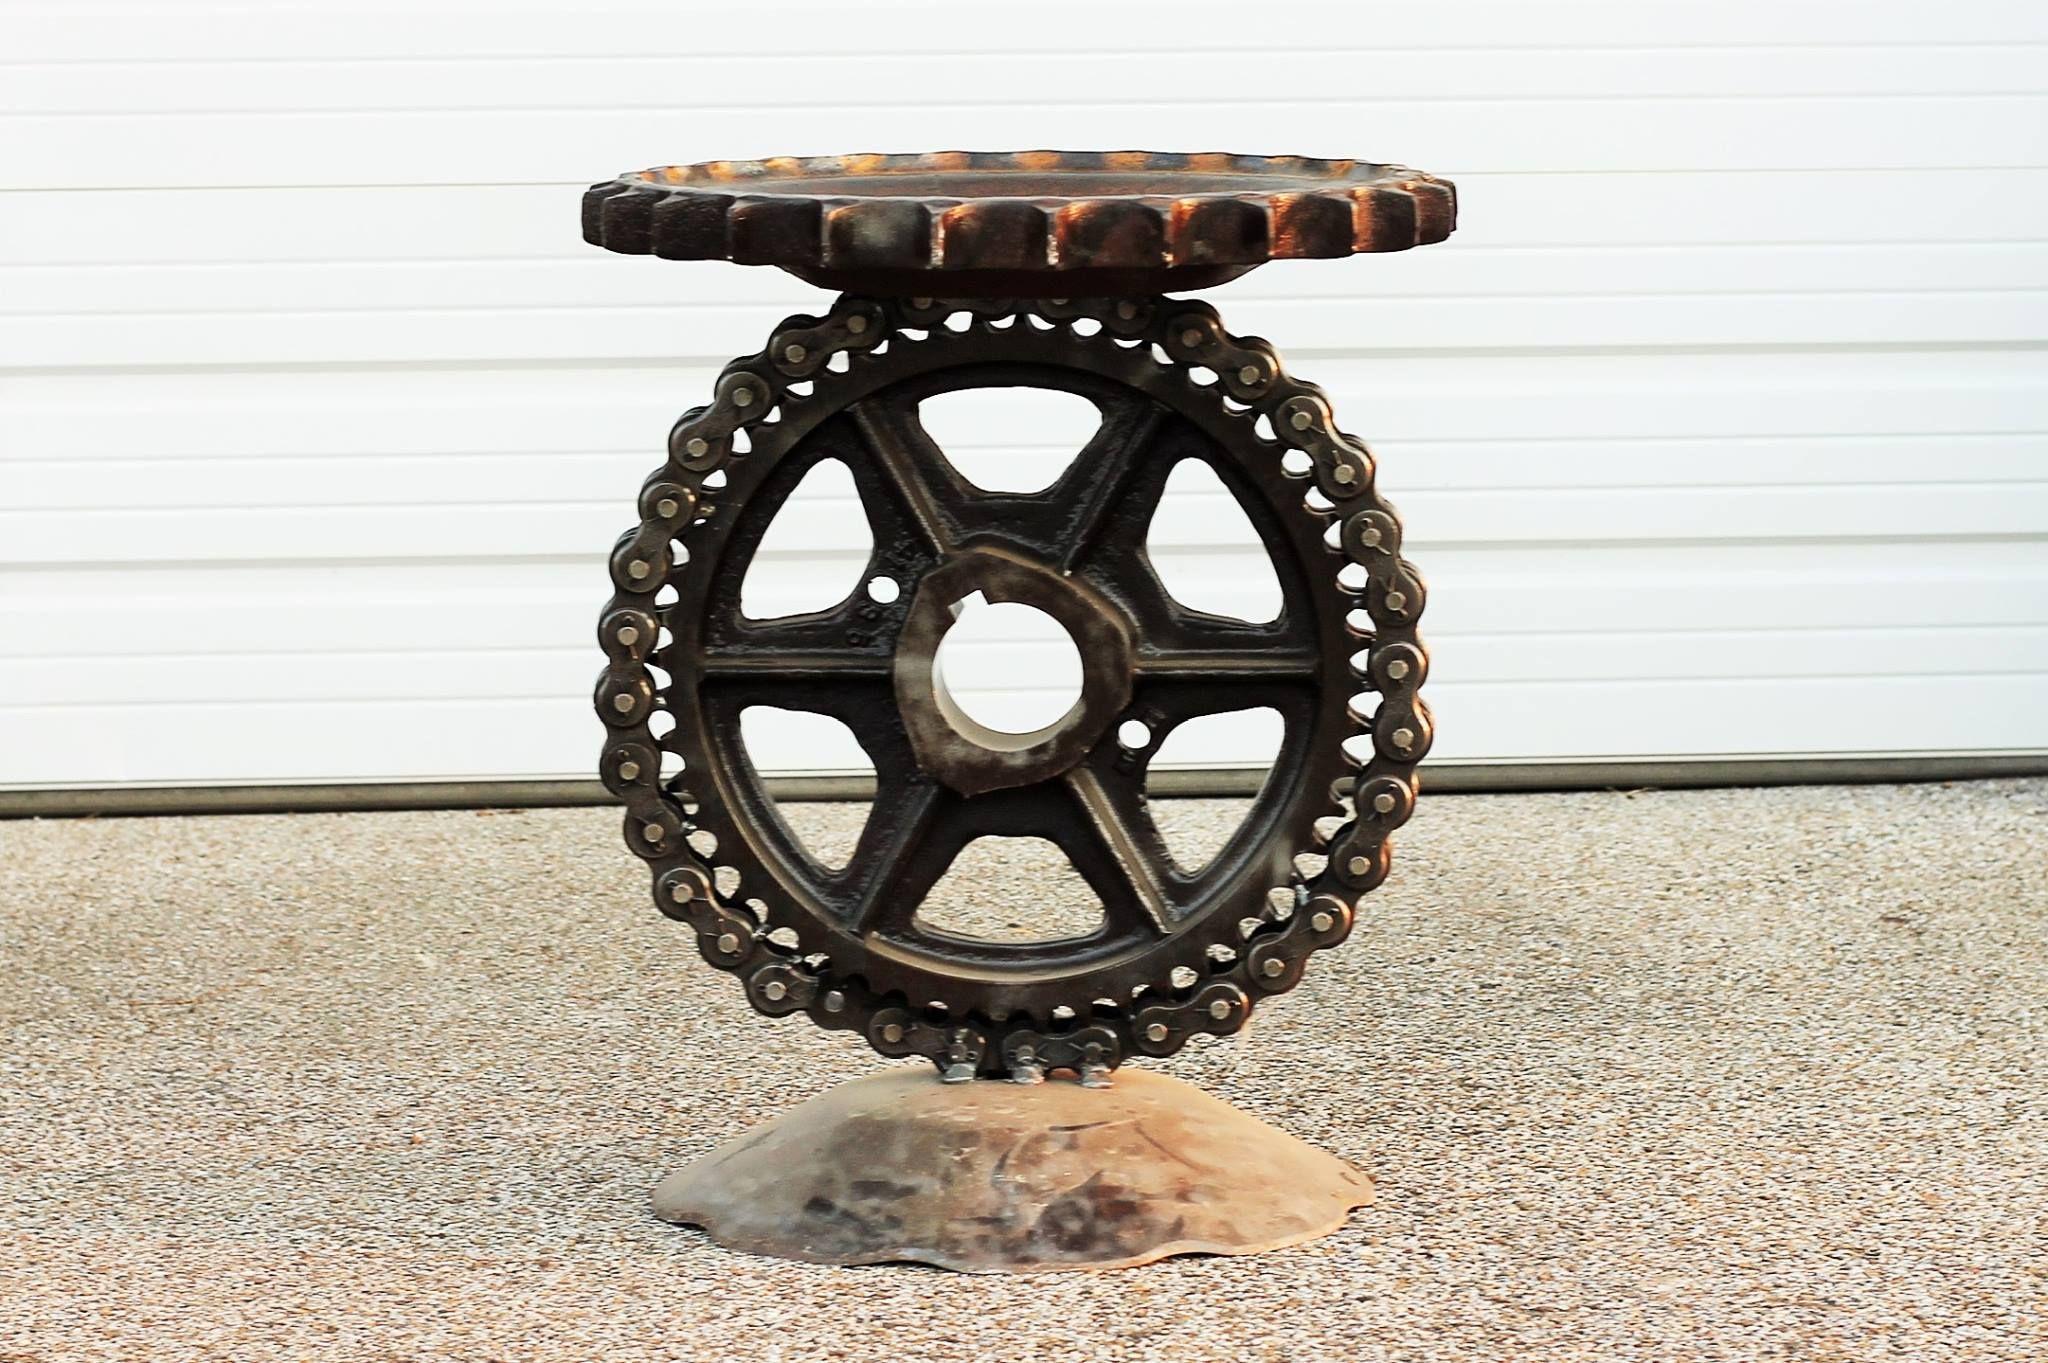 buy a handmade sculptural metal pedistal industrial steampunk